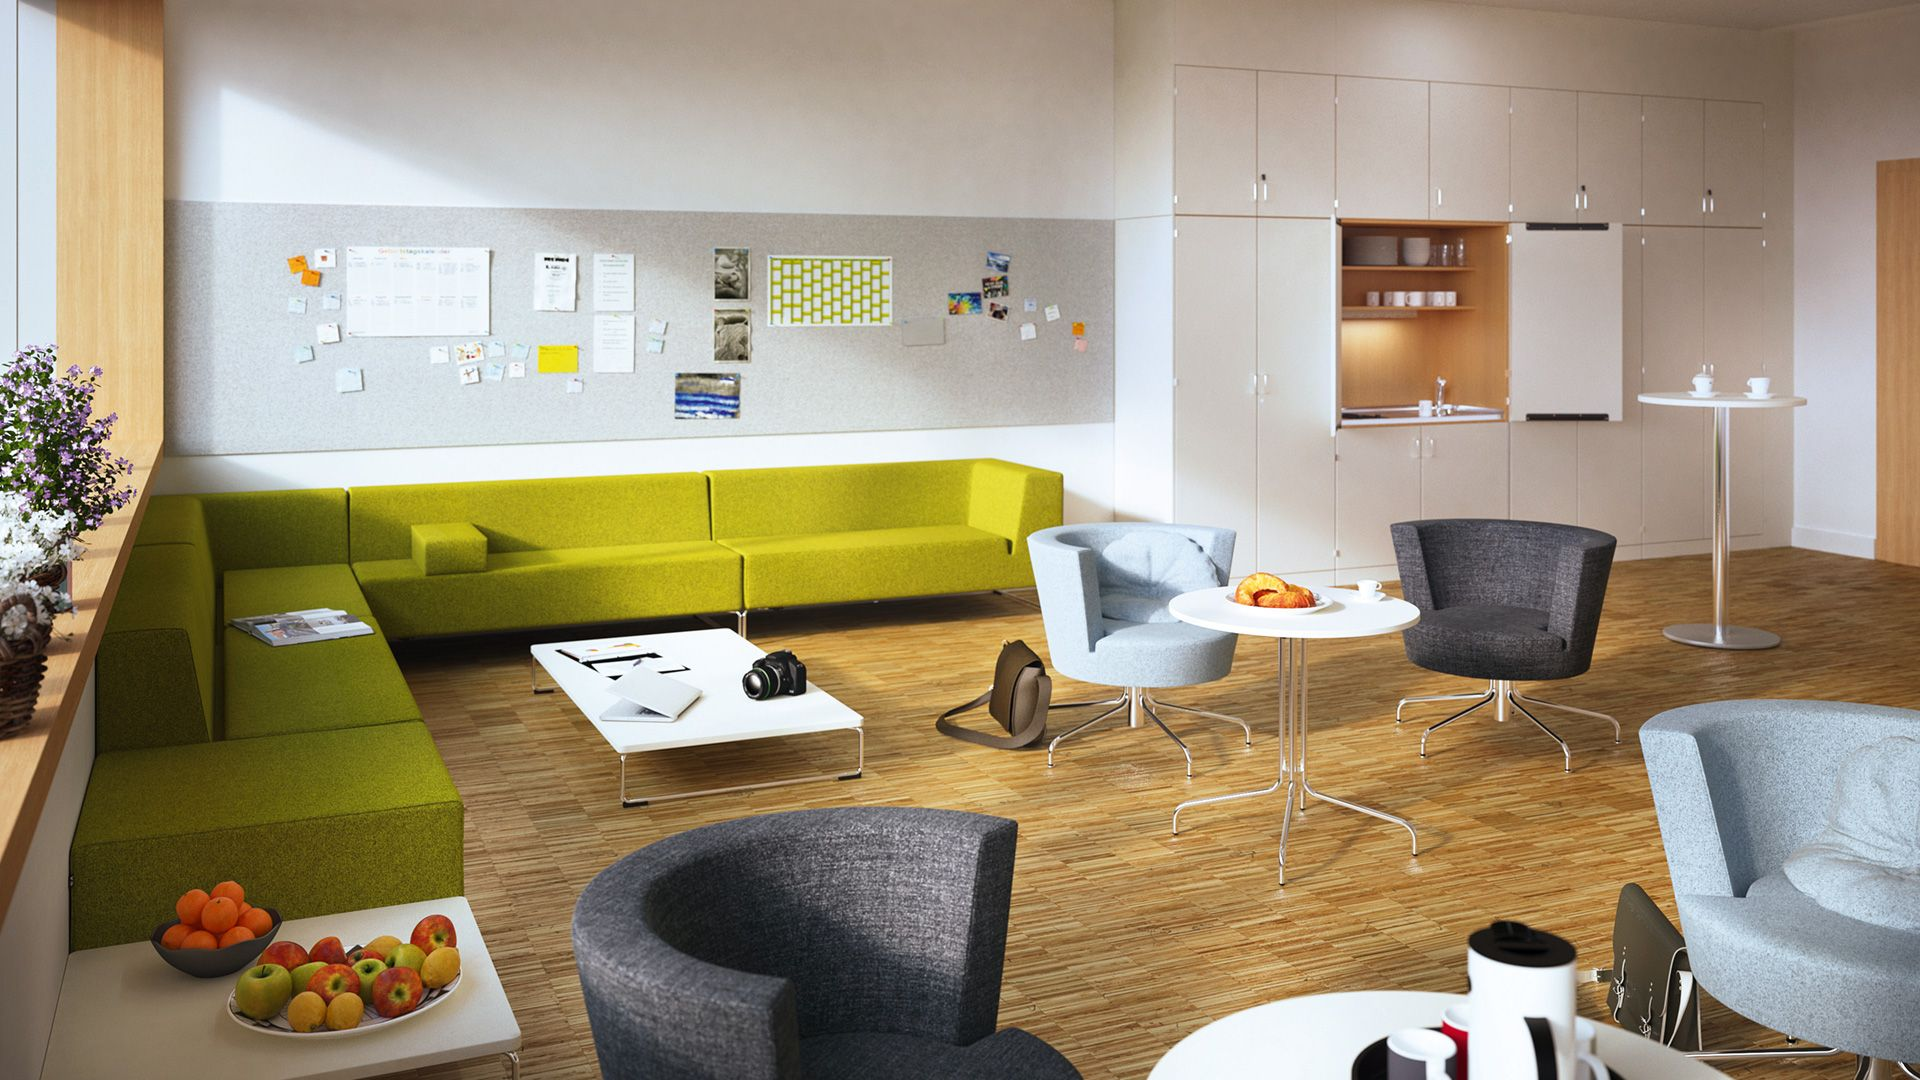 VS   Didacta   VS Furniture   Pinterest